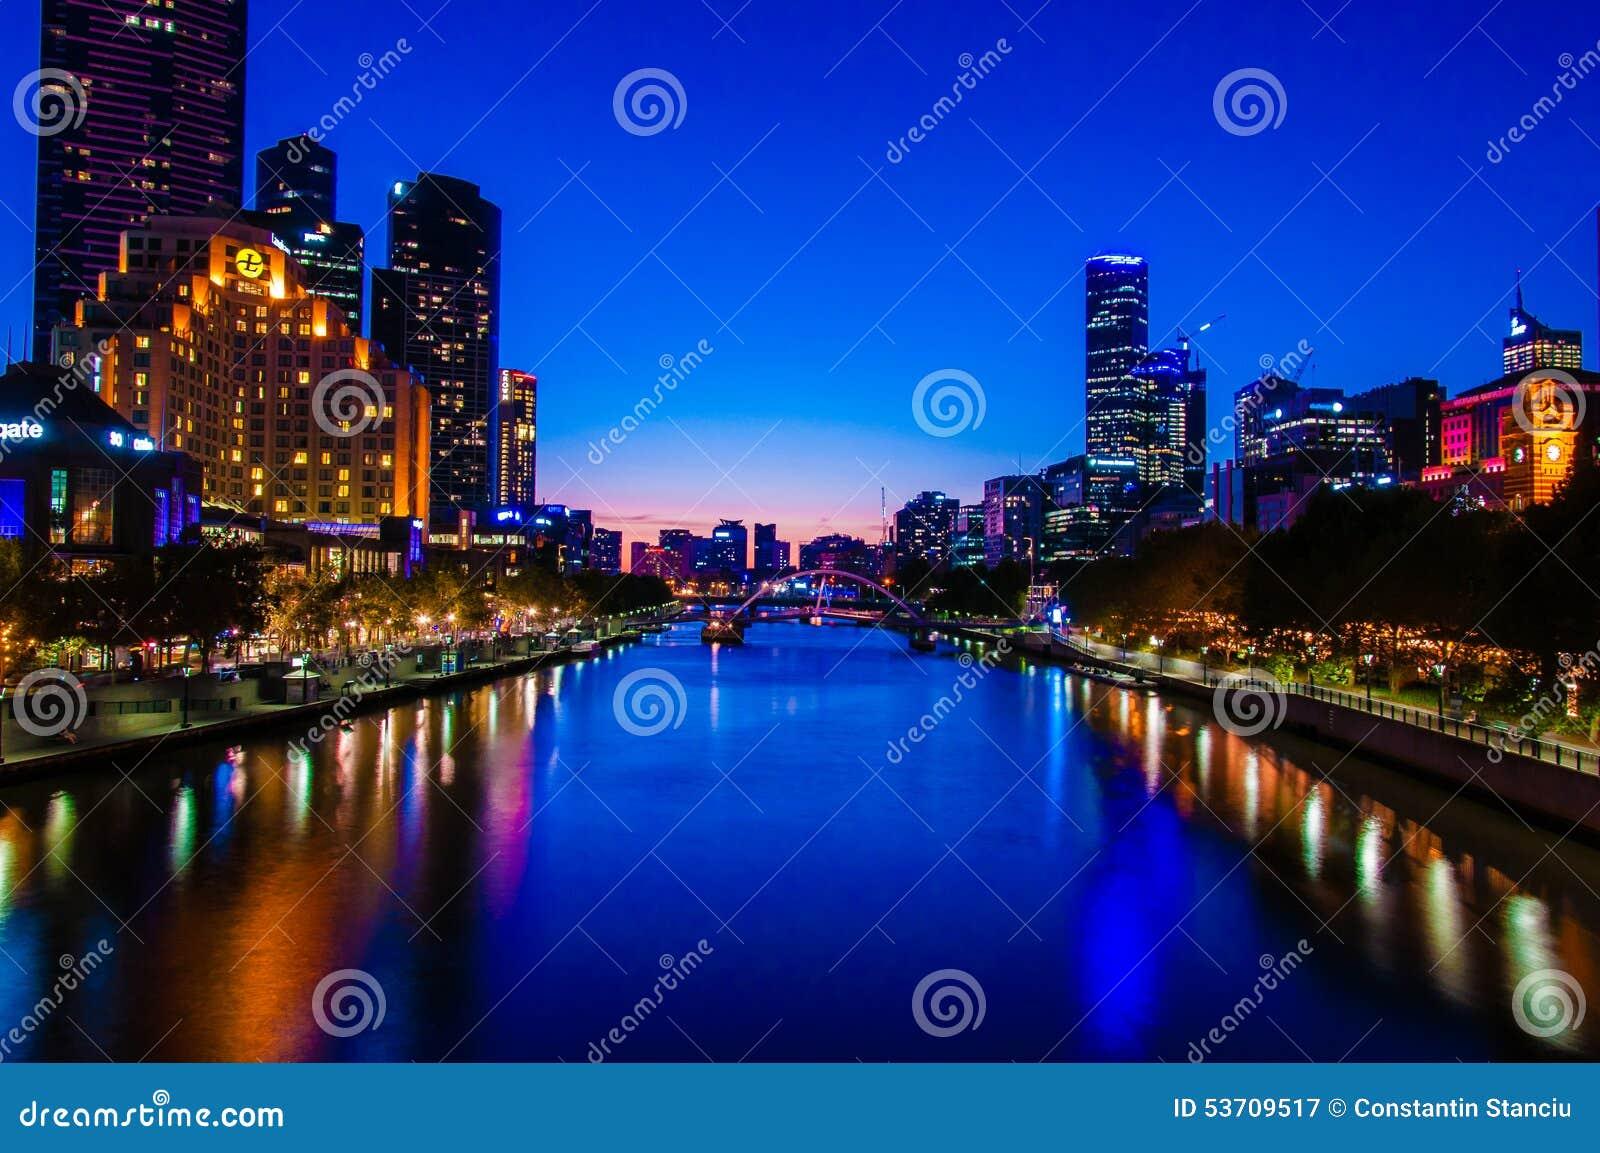 Date night houston in Melbourne